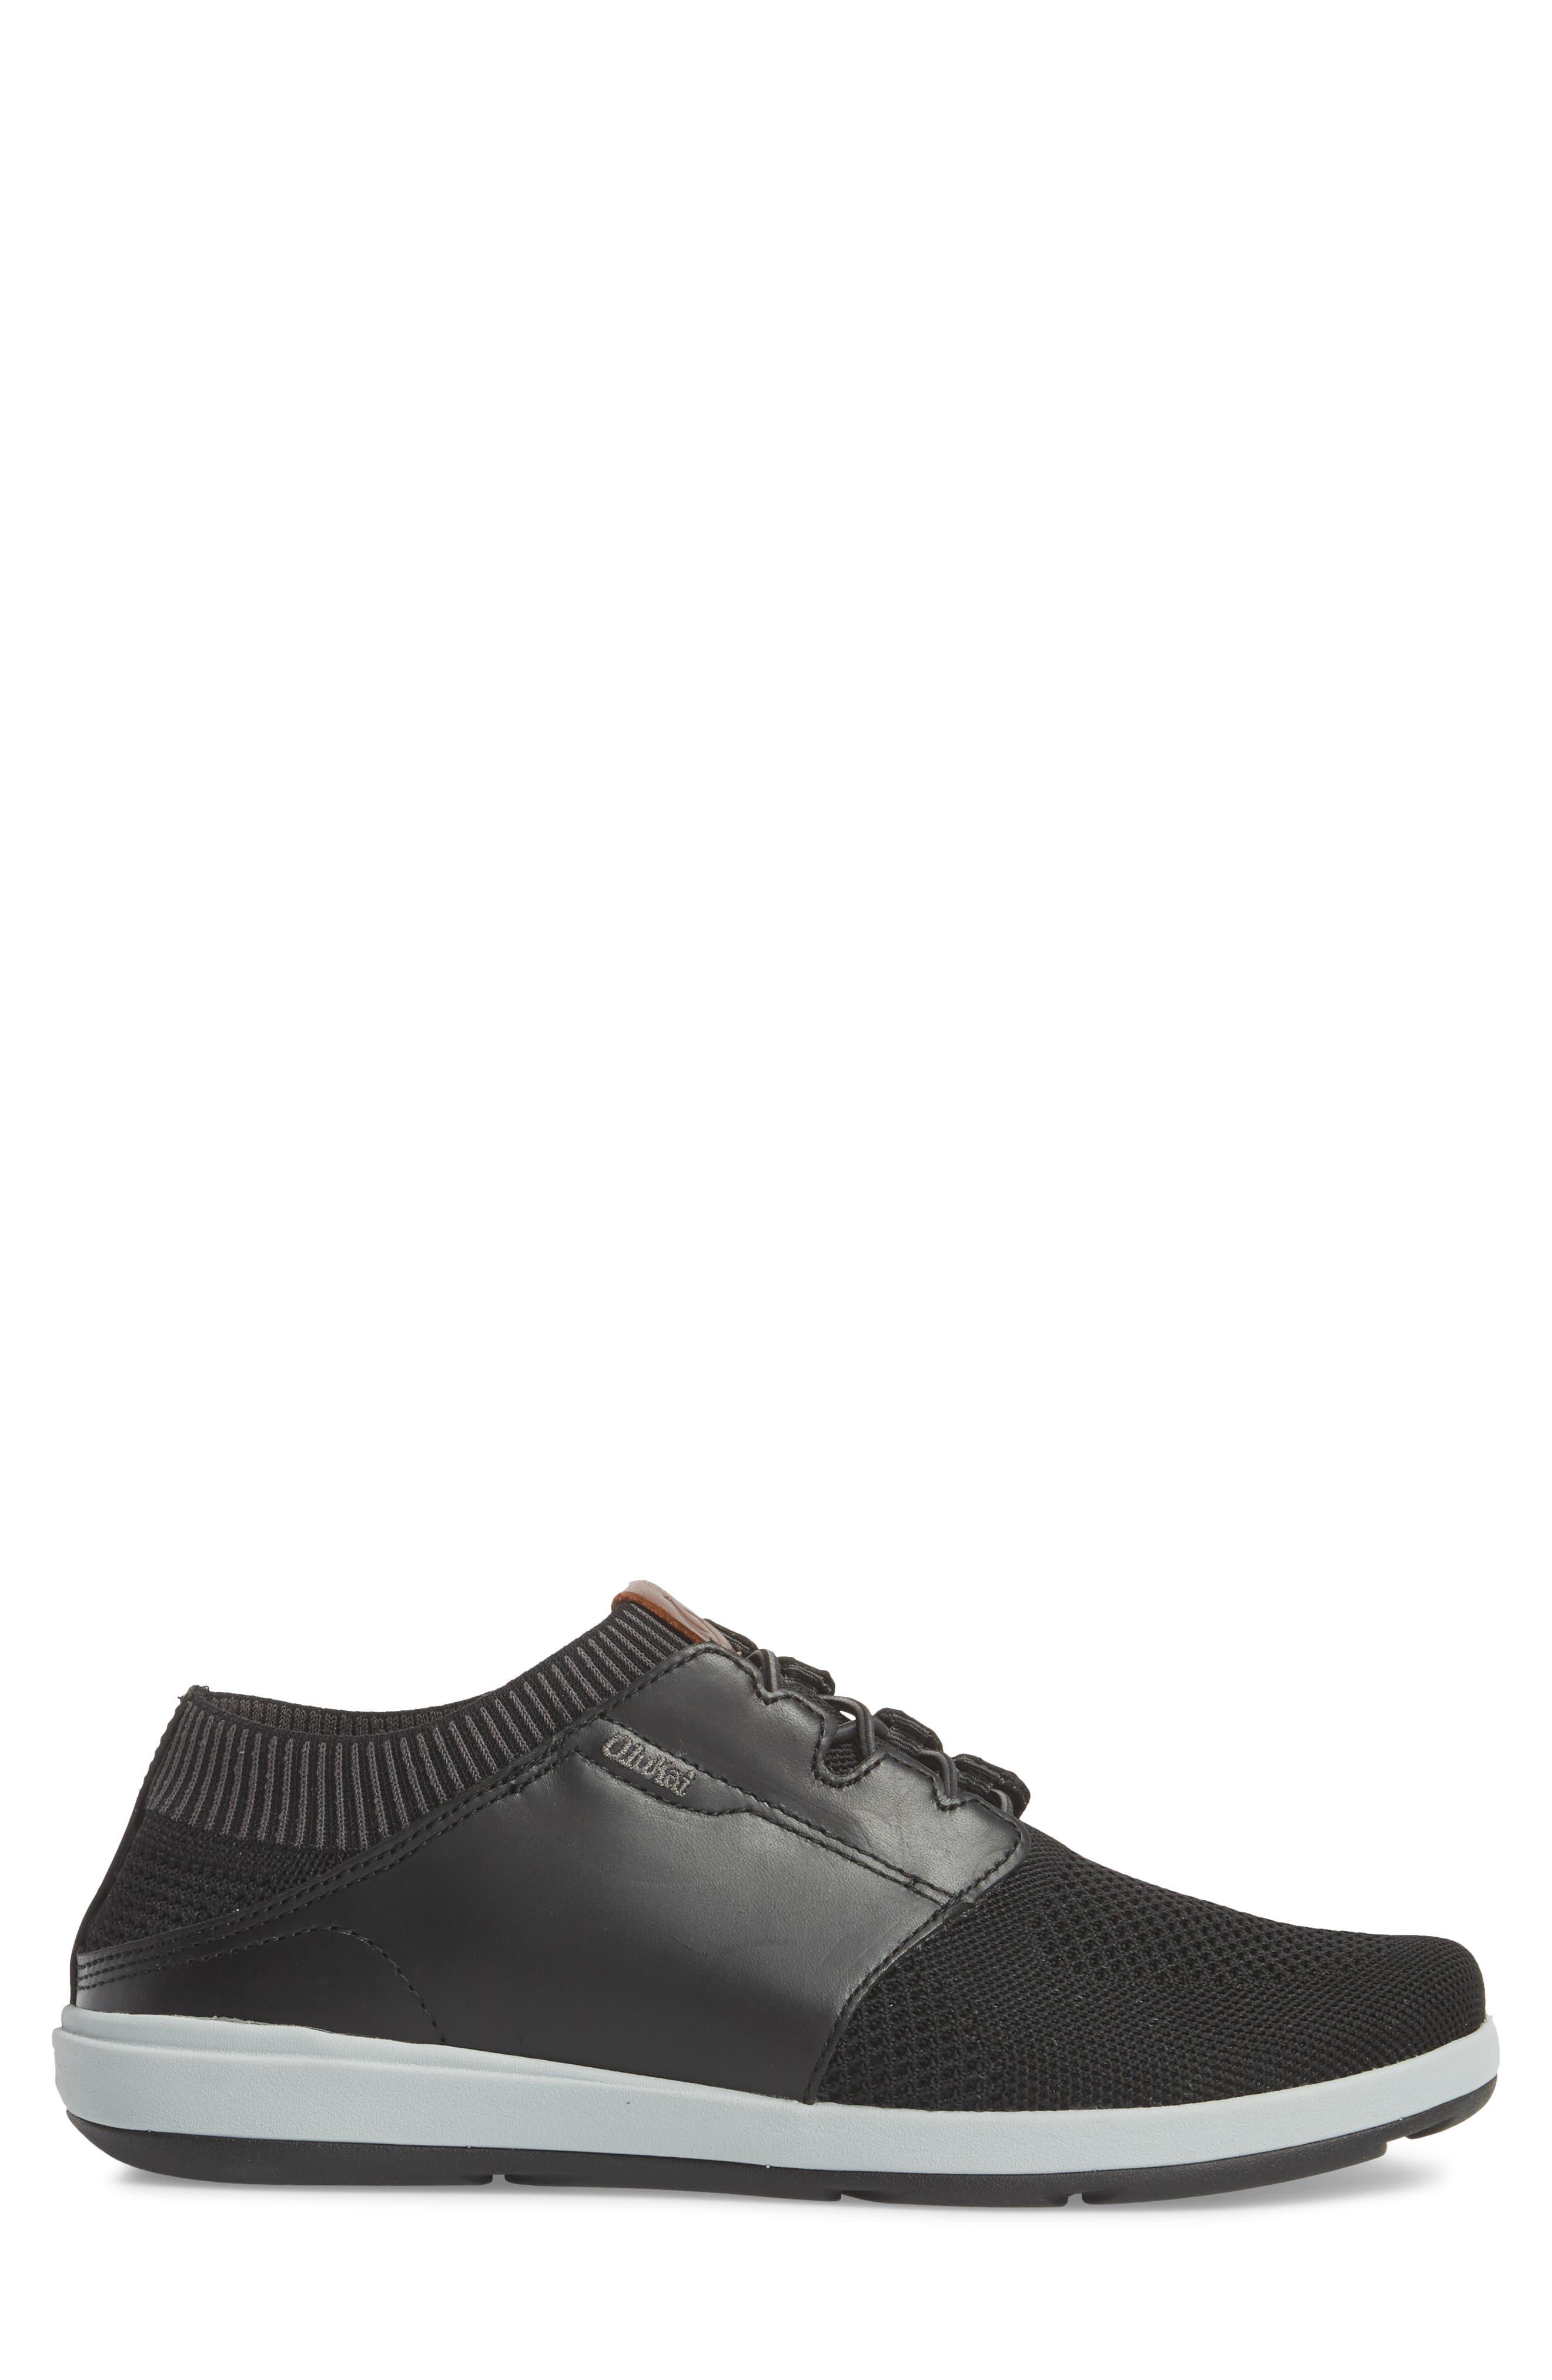 Makia Ulana Sneaker,                             Alternate thumbnail 3, color,                             BLACK/ BLACK